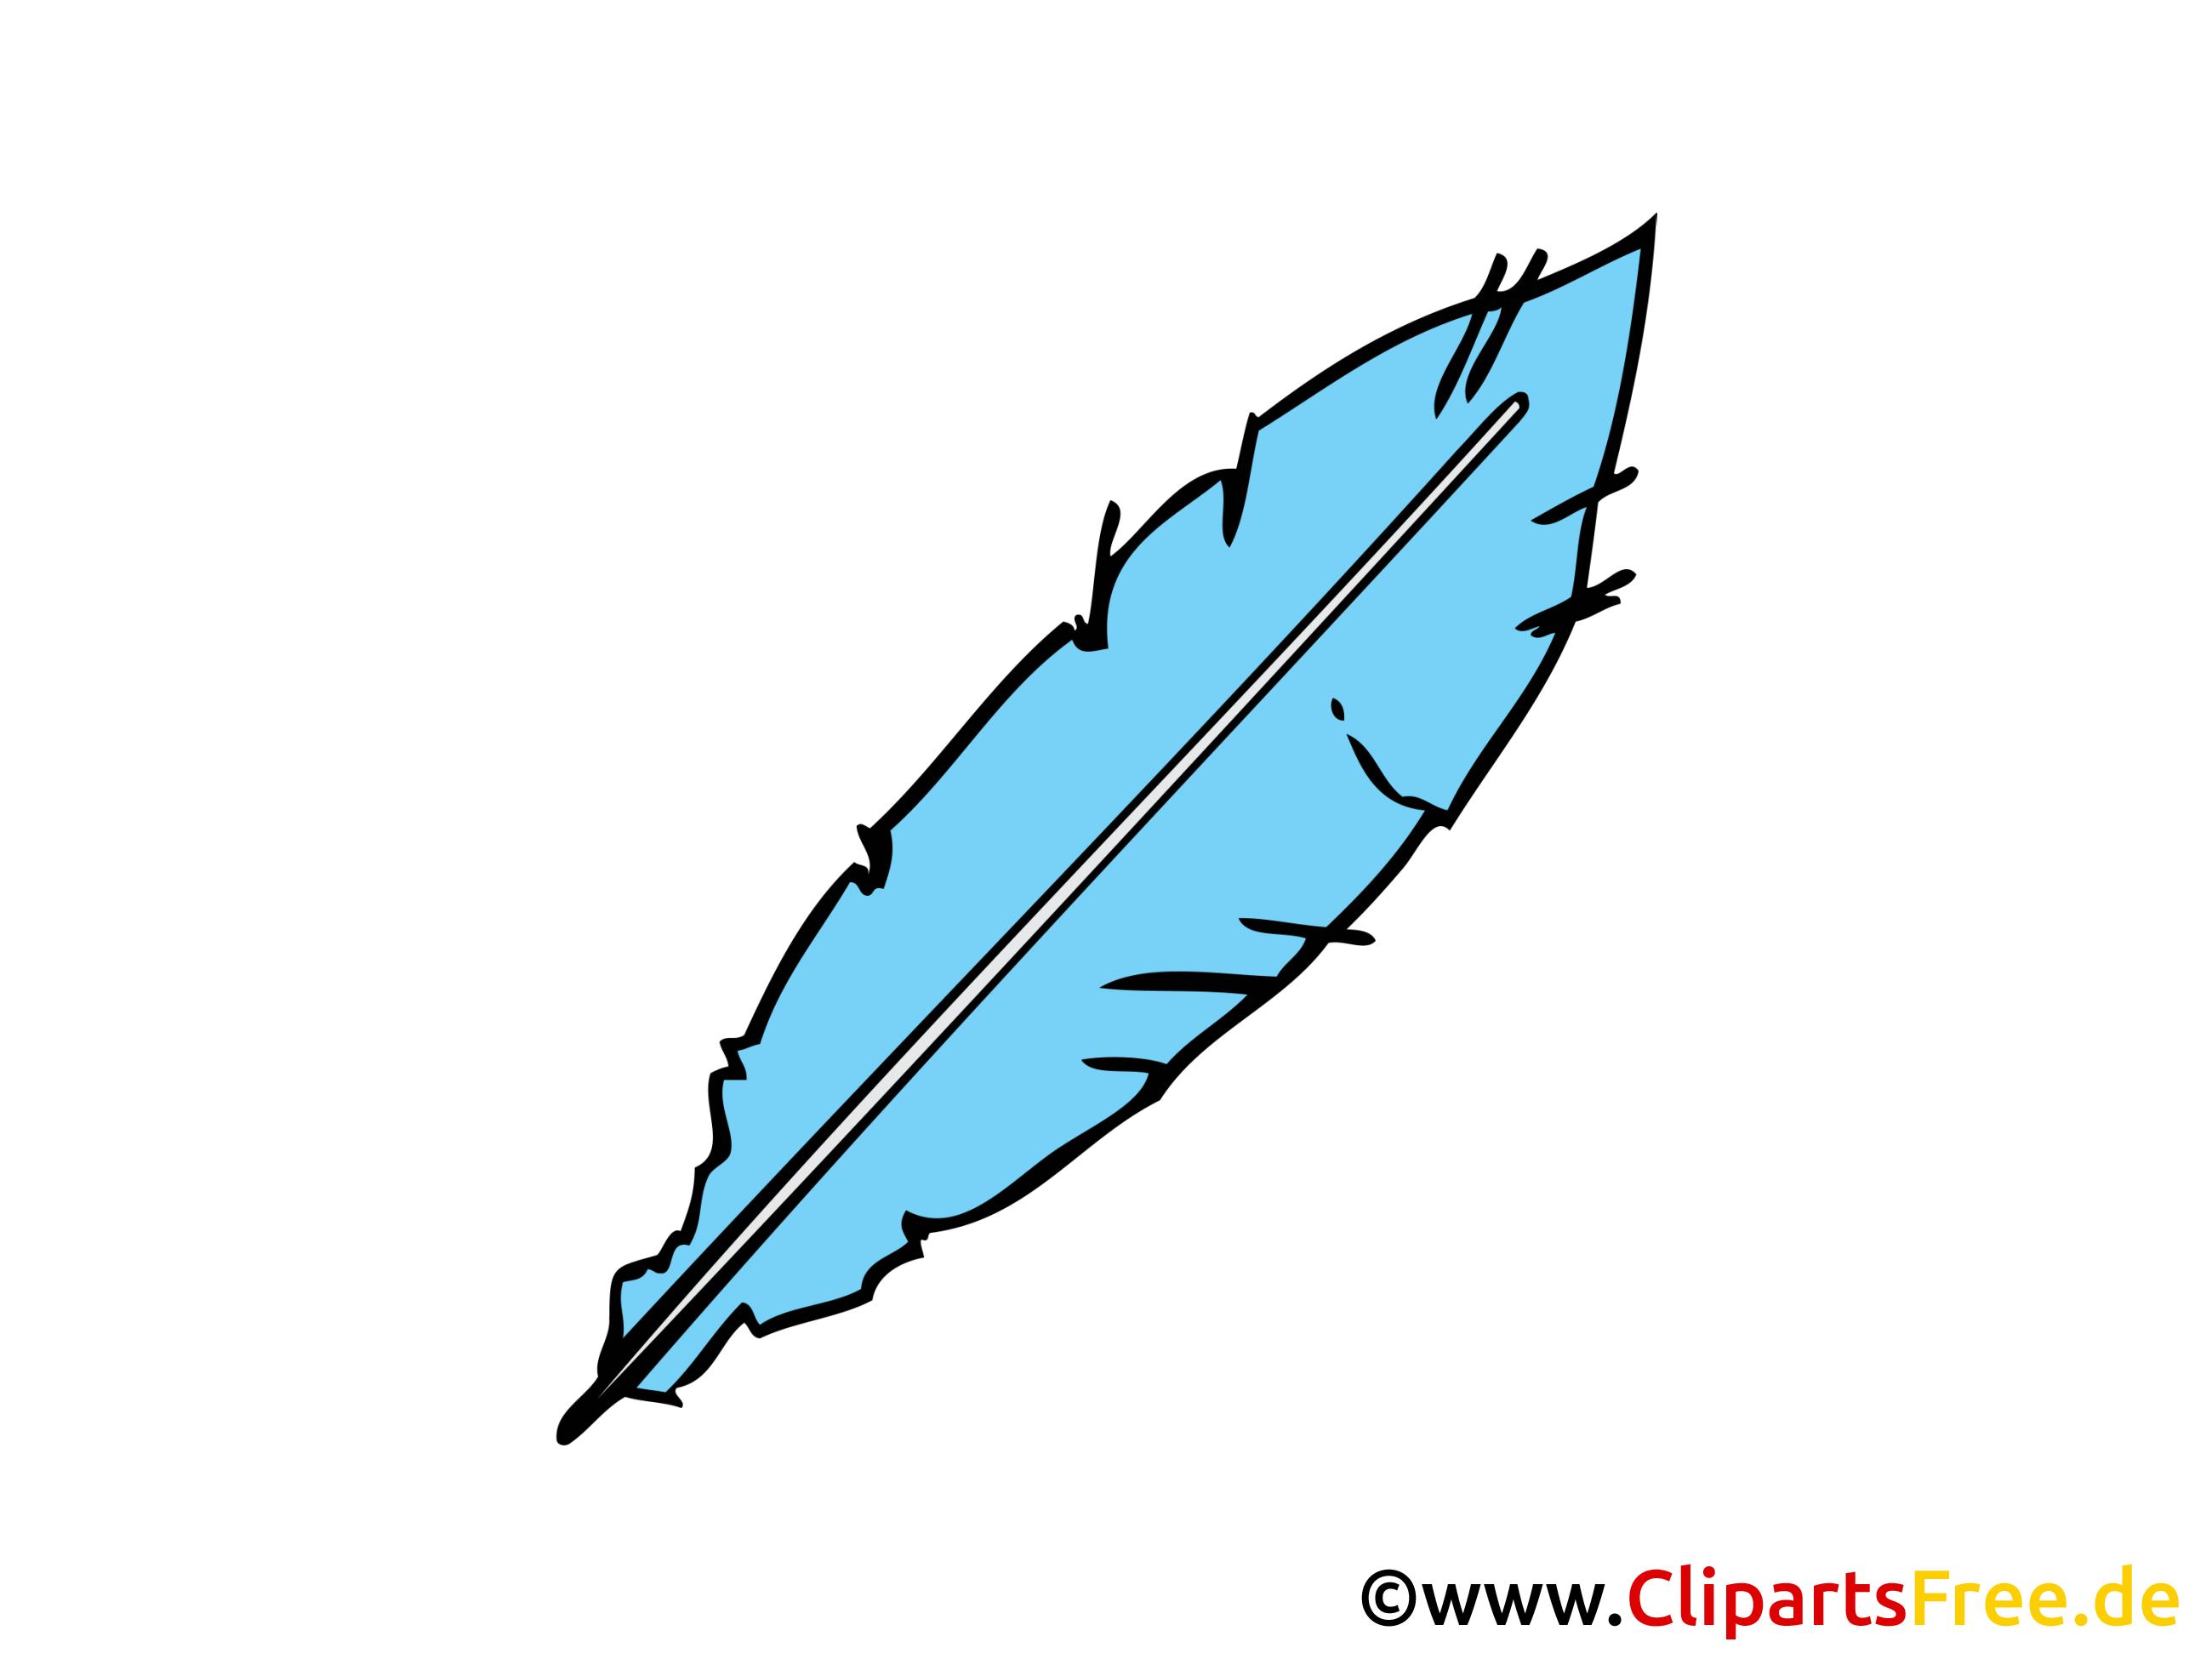 Plume clipart gratuit vector library Plume clipart gratuit - ClipartFox vector library